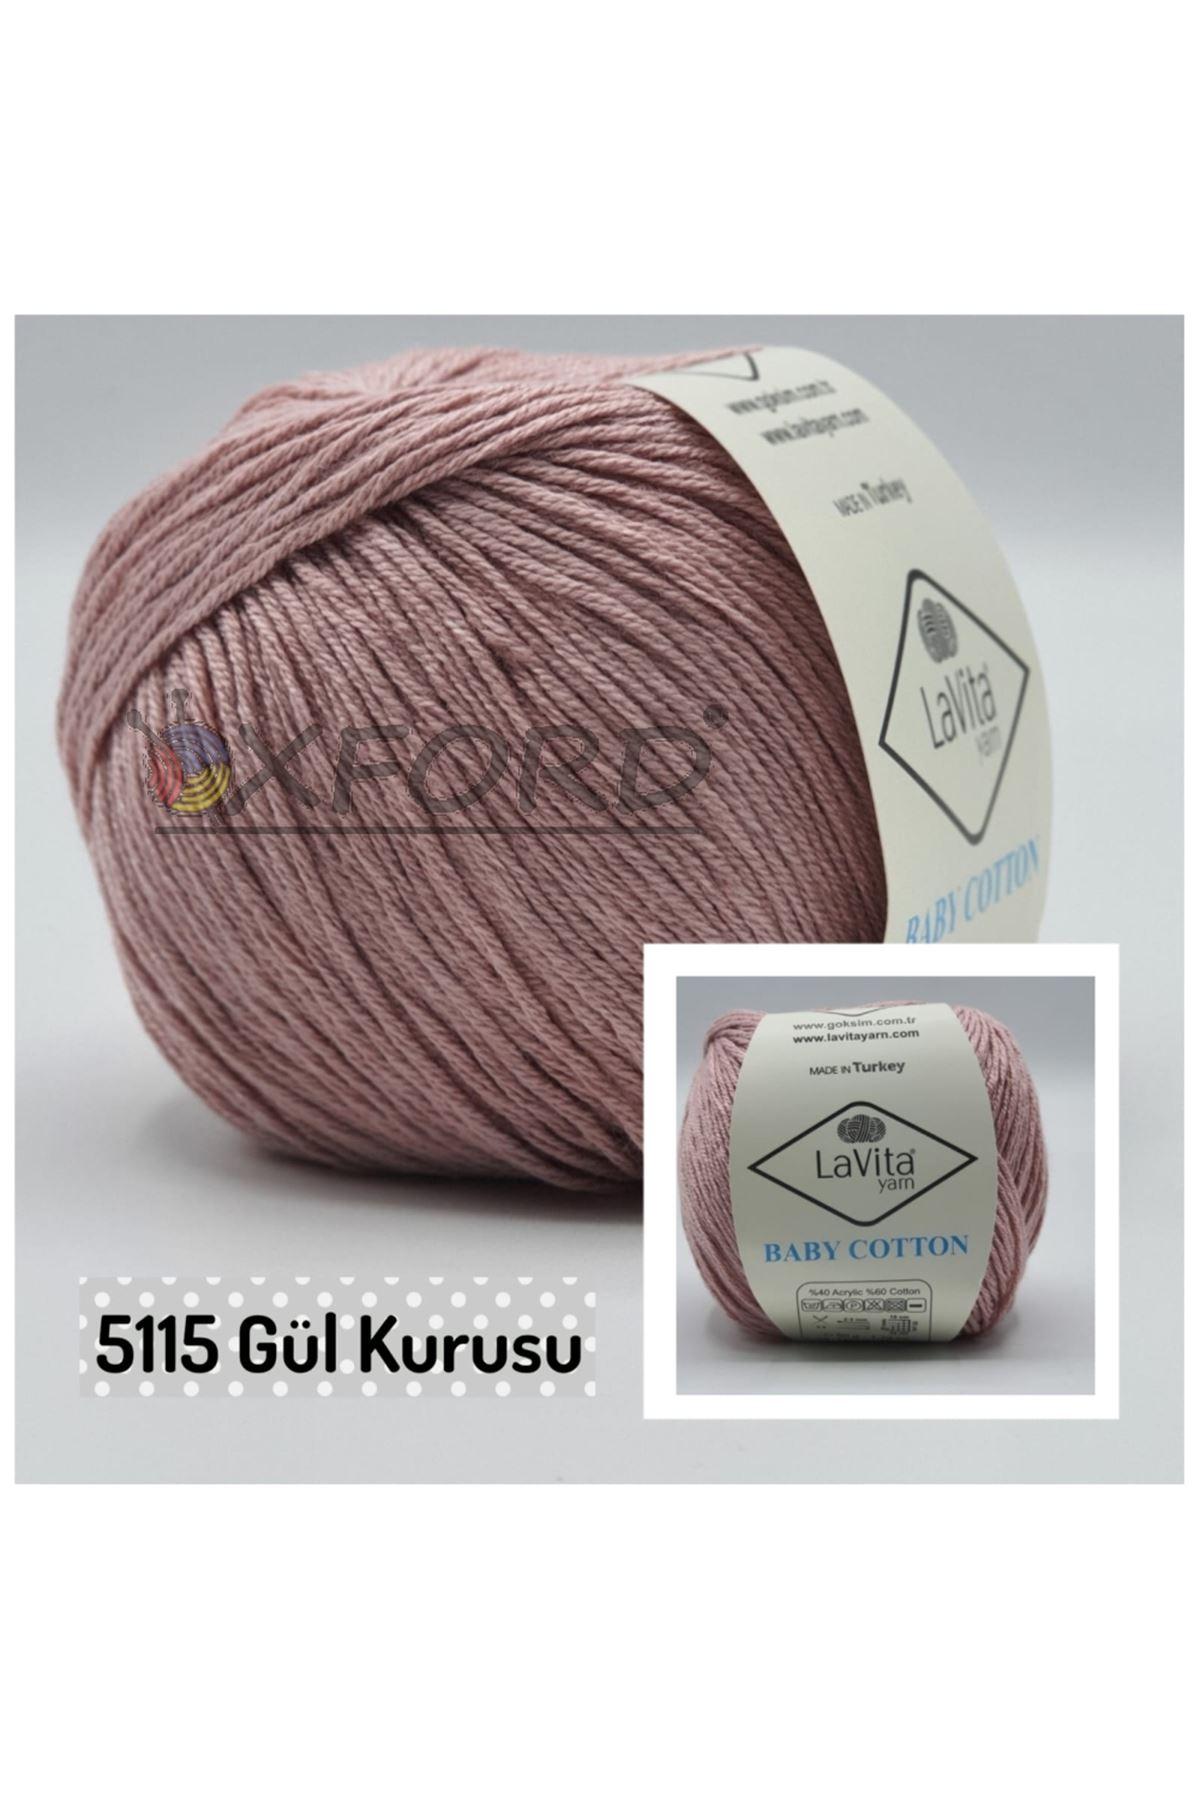 Lavita Baby Cotton 5115 Gülkurusu